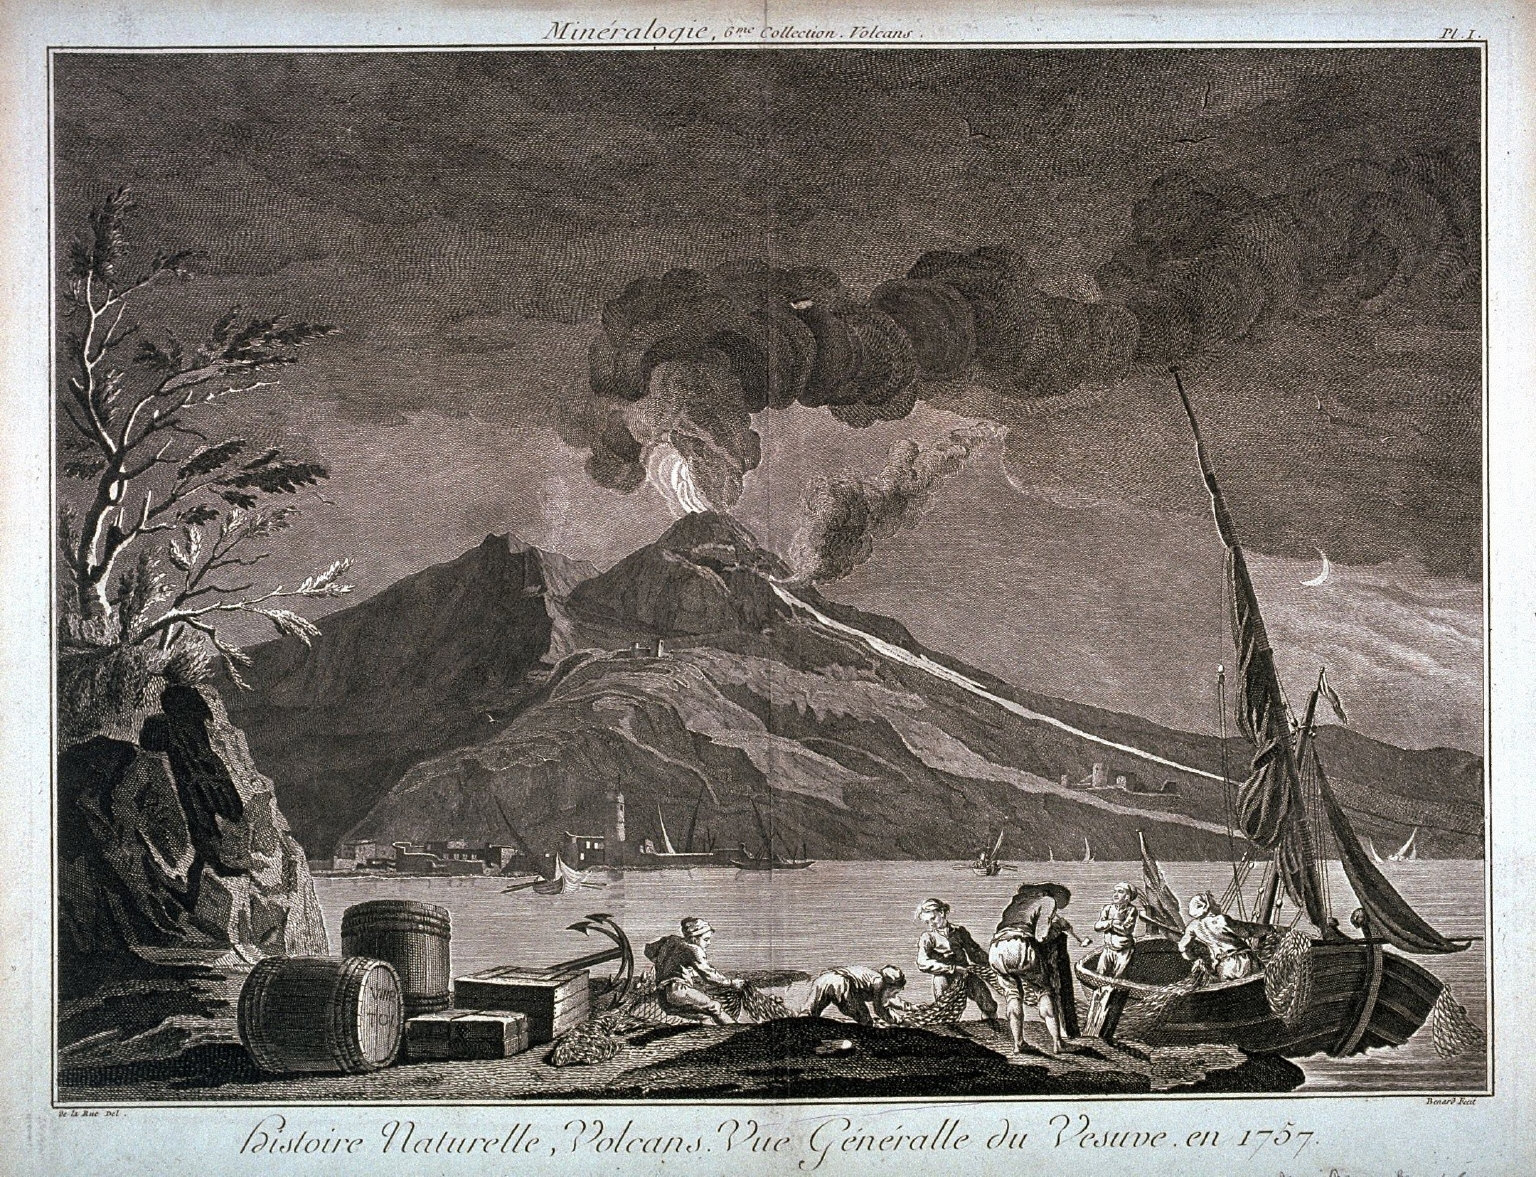 Vue Generalle du Vesuve, en 1757 (View of Vesuvius in 1757), pl. 1 from Minéralogie, 6me Collection. Volcans